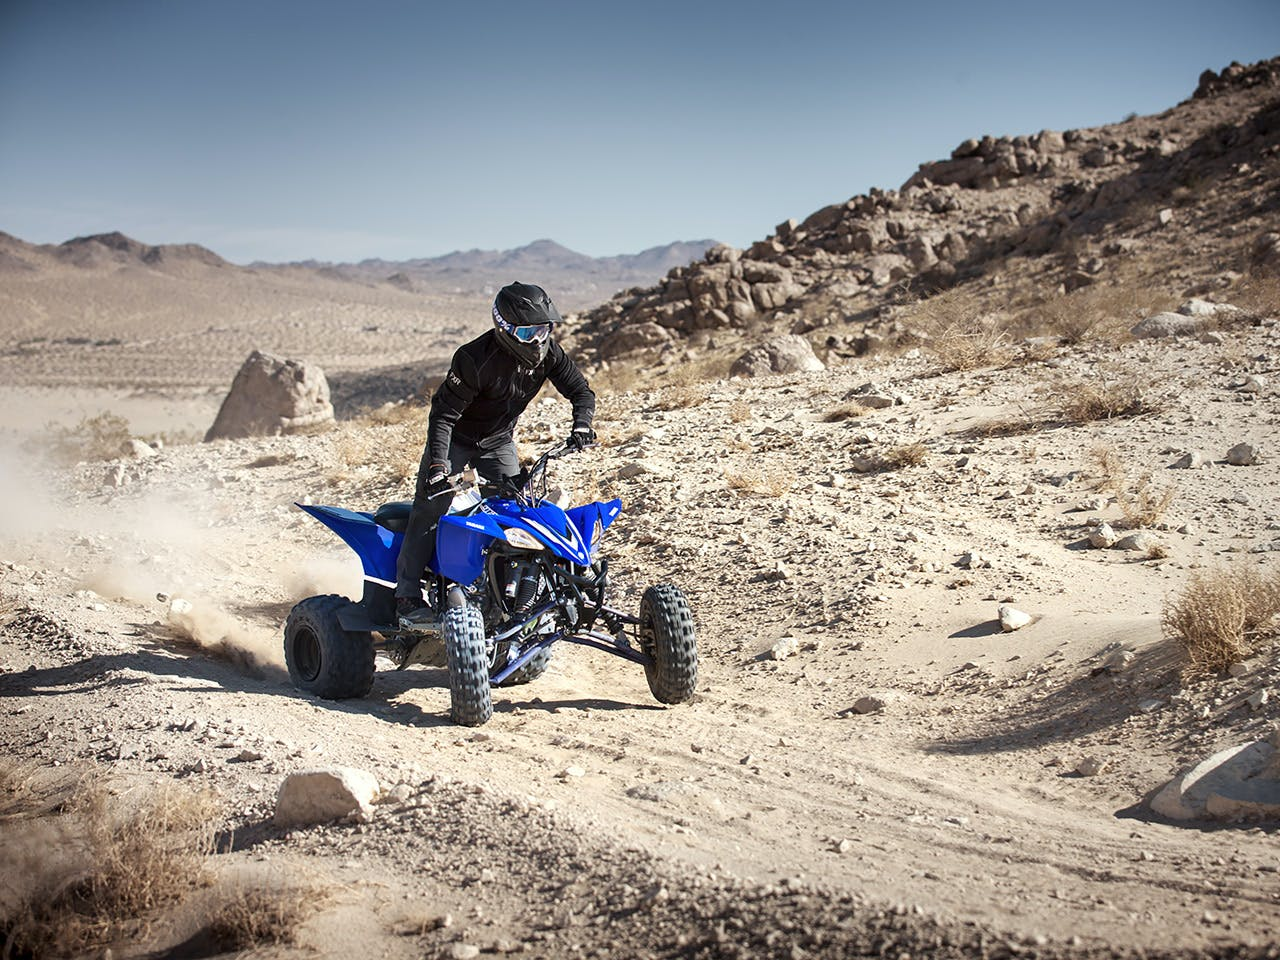 Yamaha YFZ450R in team yamaha blue colour , being ridden in the desert